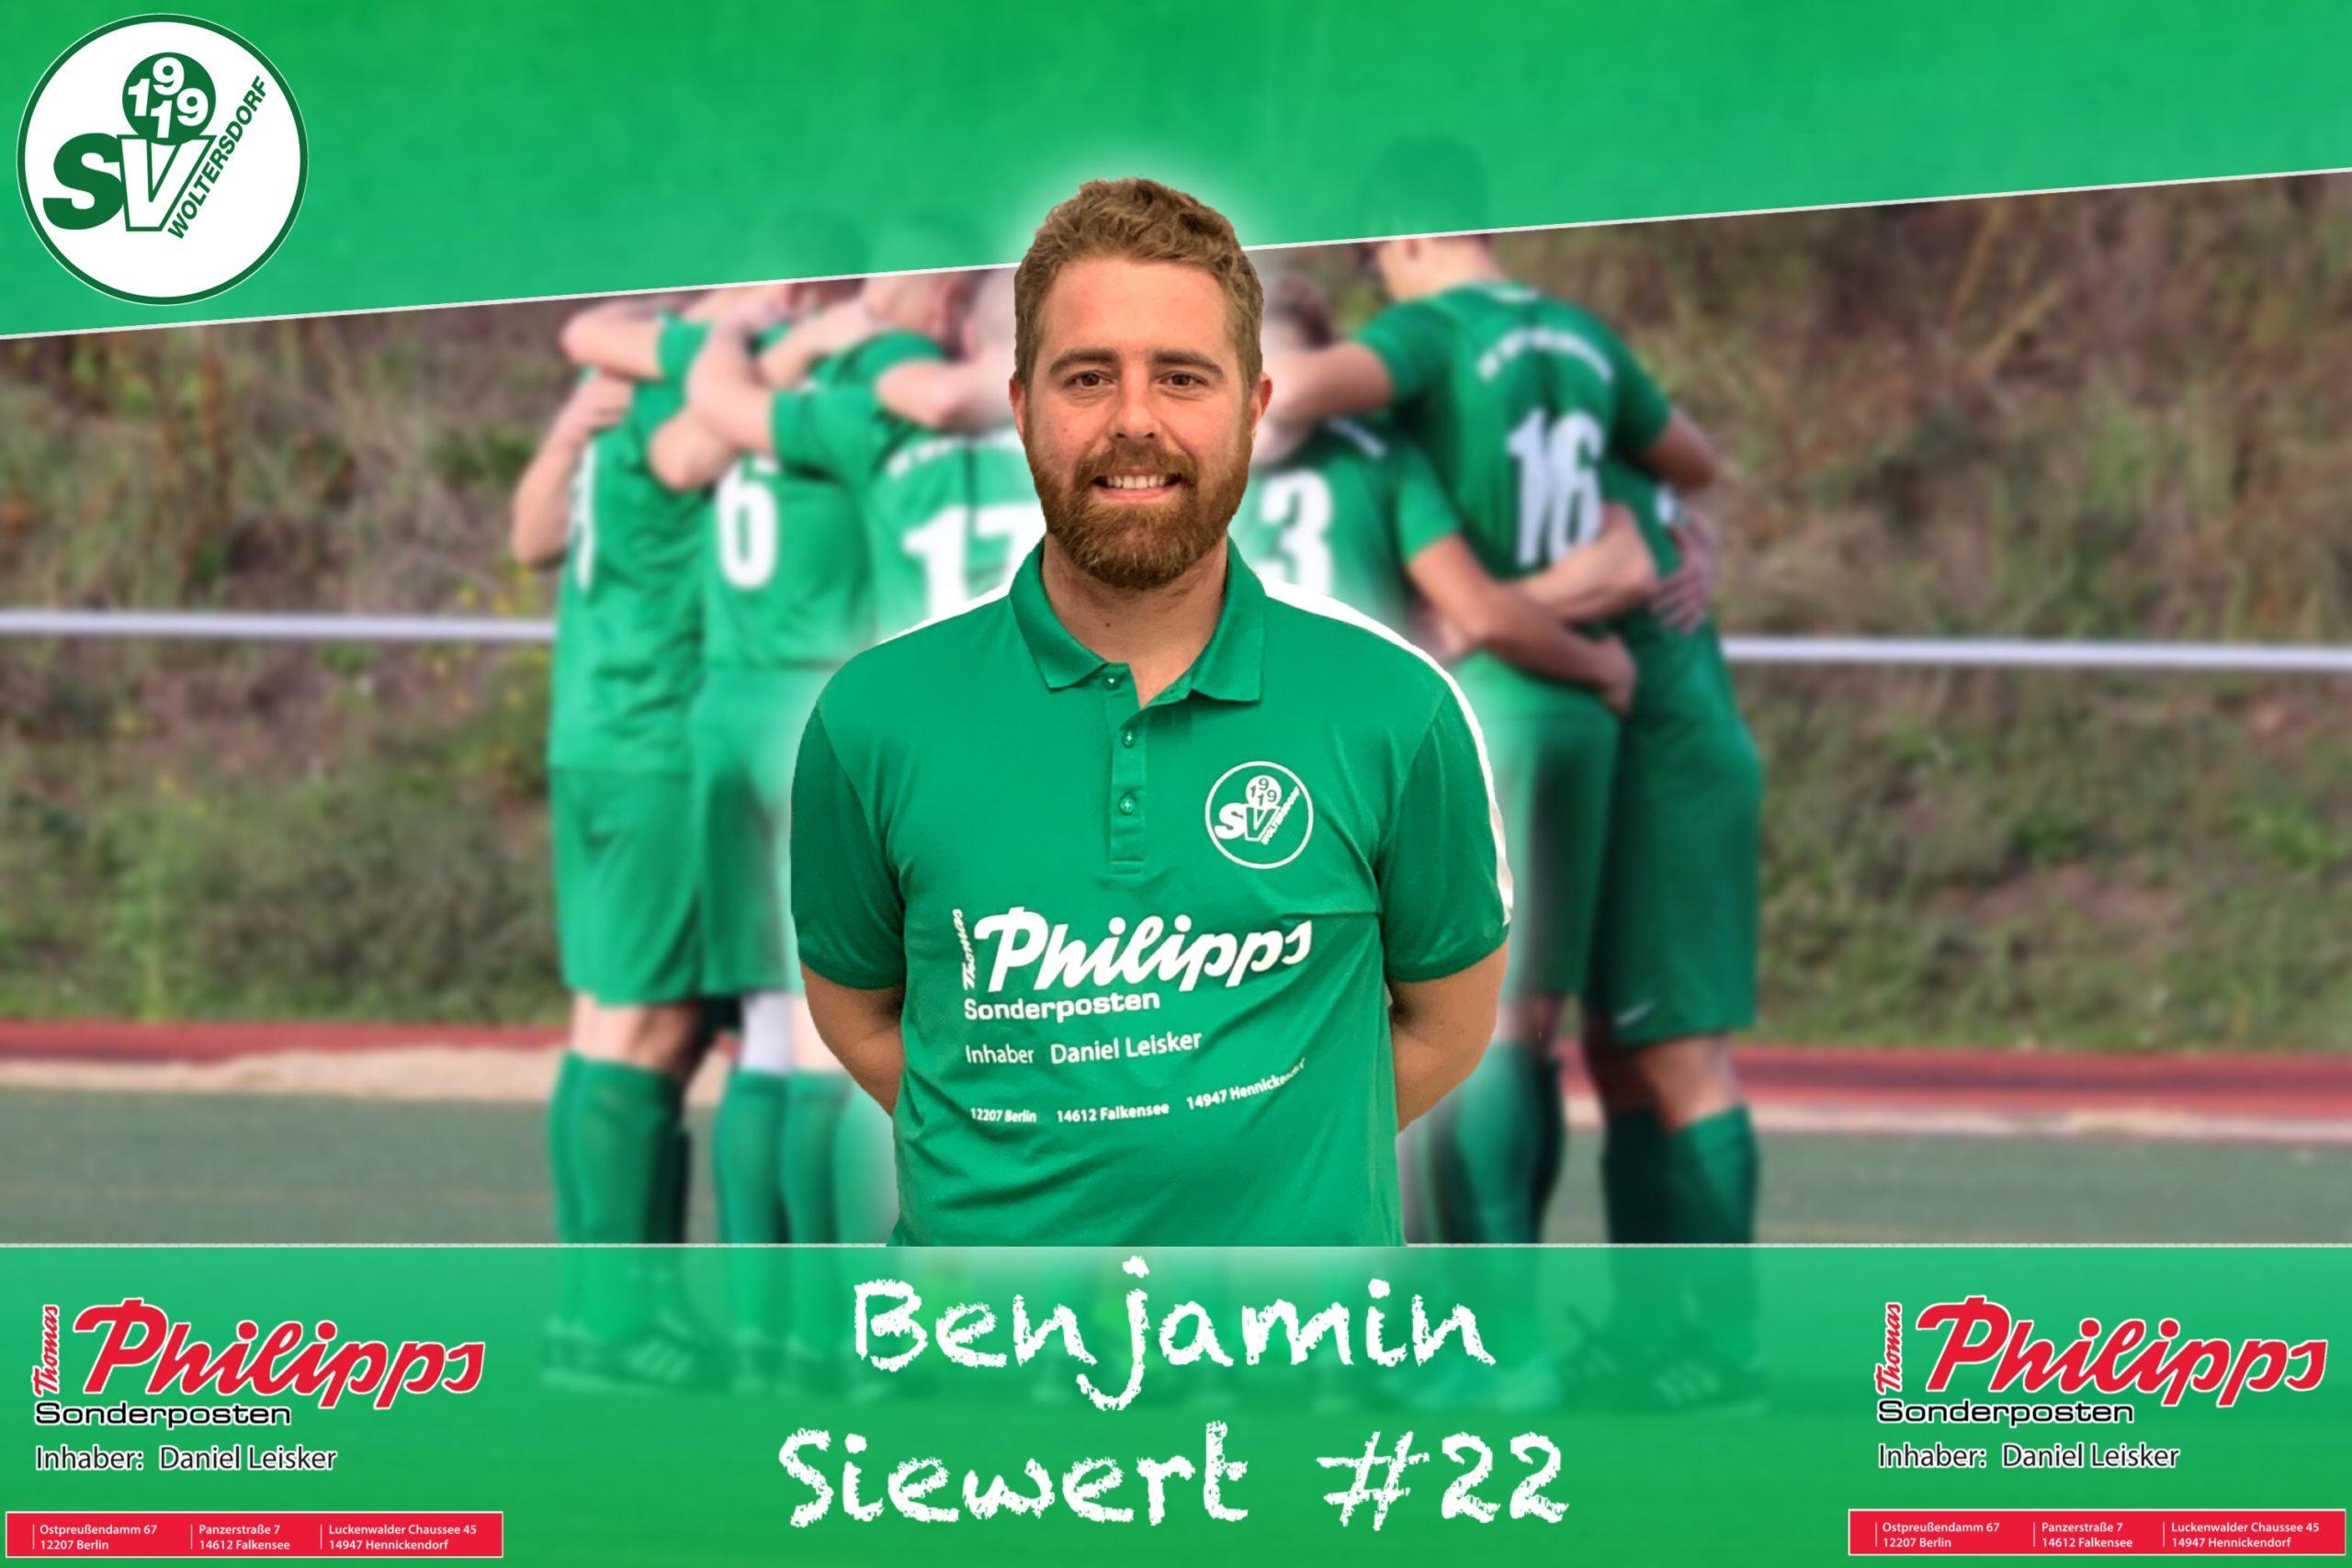 Benjamin Siewert